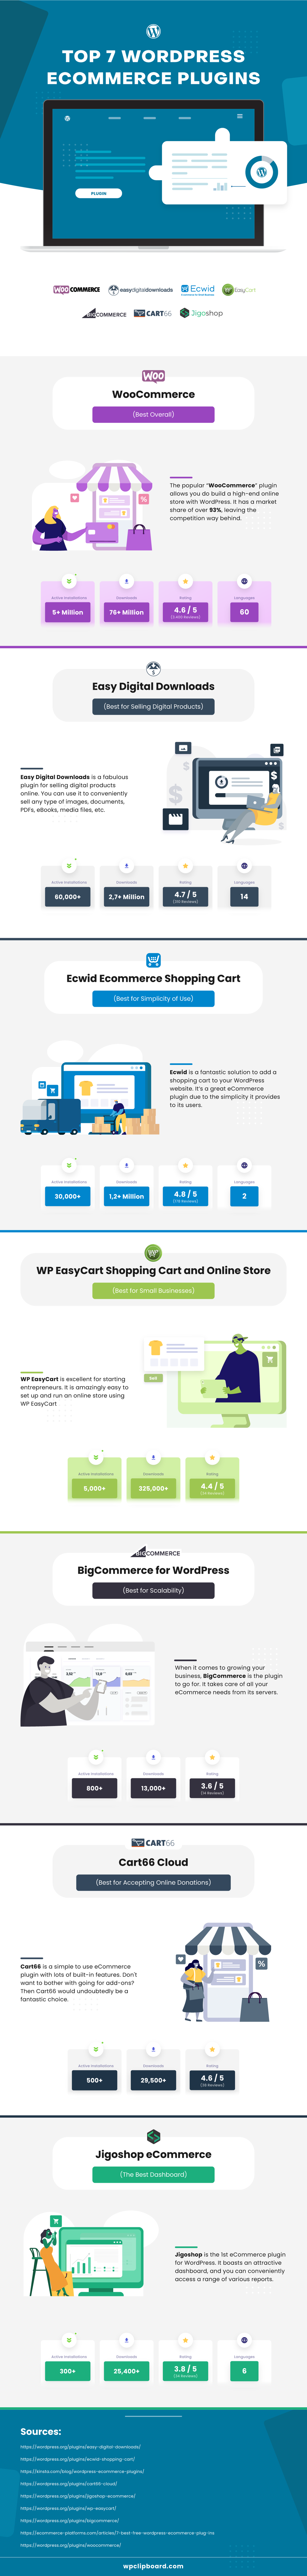 infographic showing top 7 wordpress ecommerce plugins